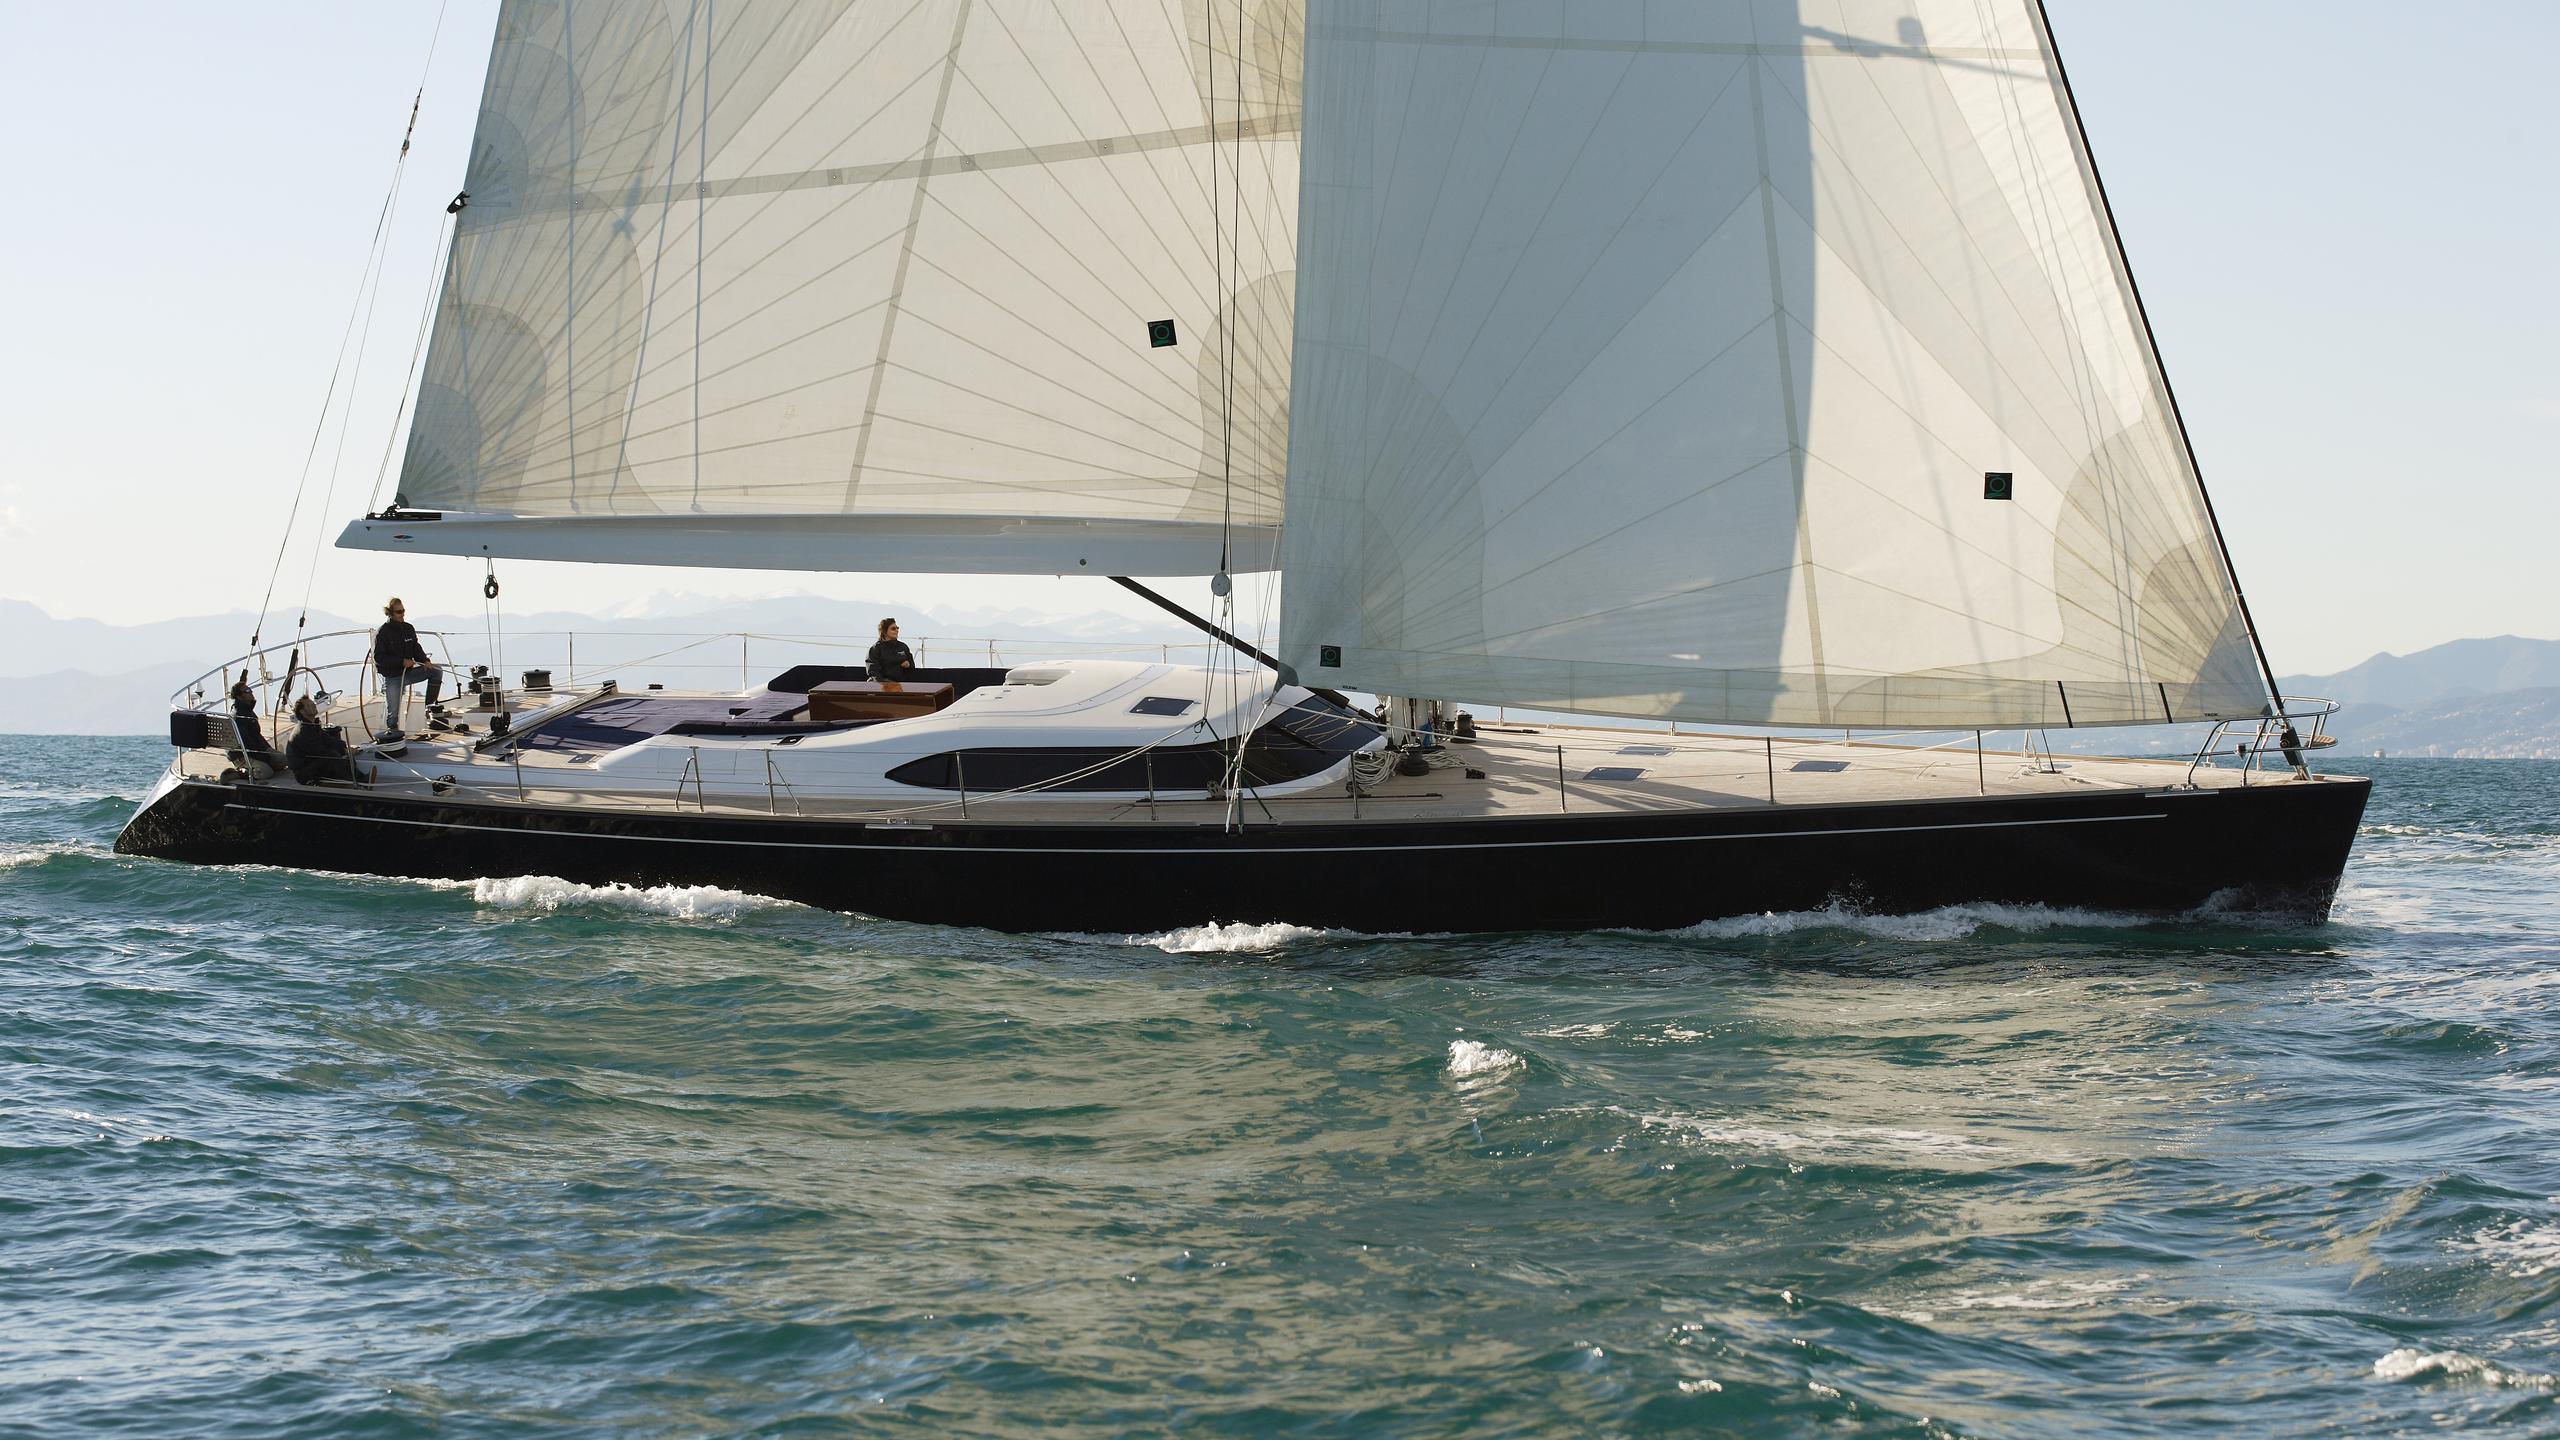 si vis pacem sailing yacht southern wind shipyard 24m 2005 profile